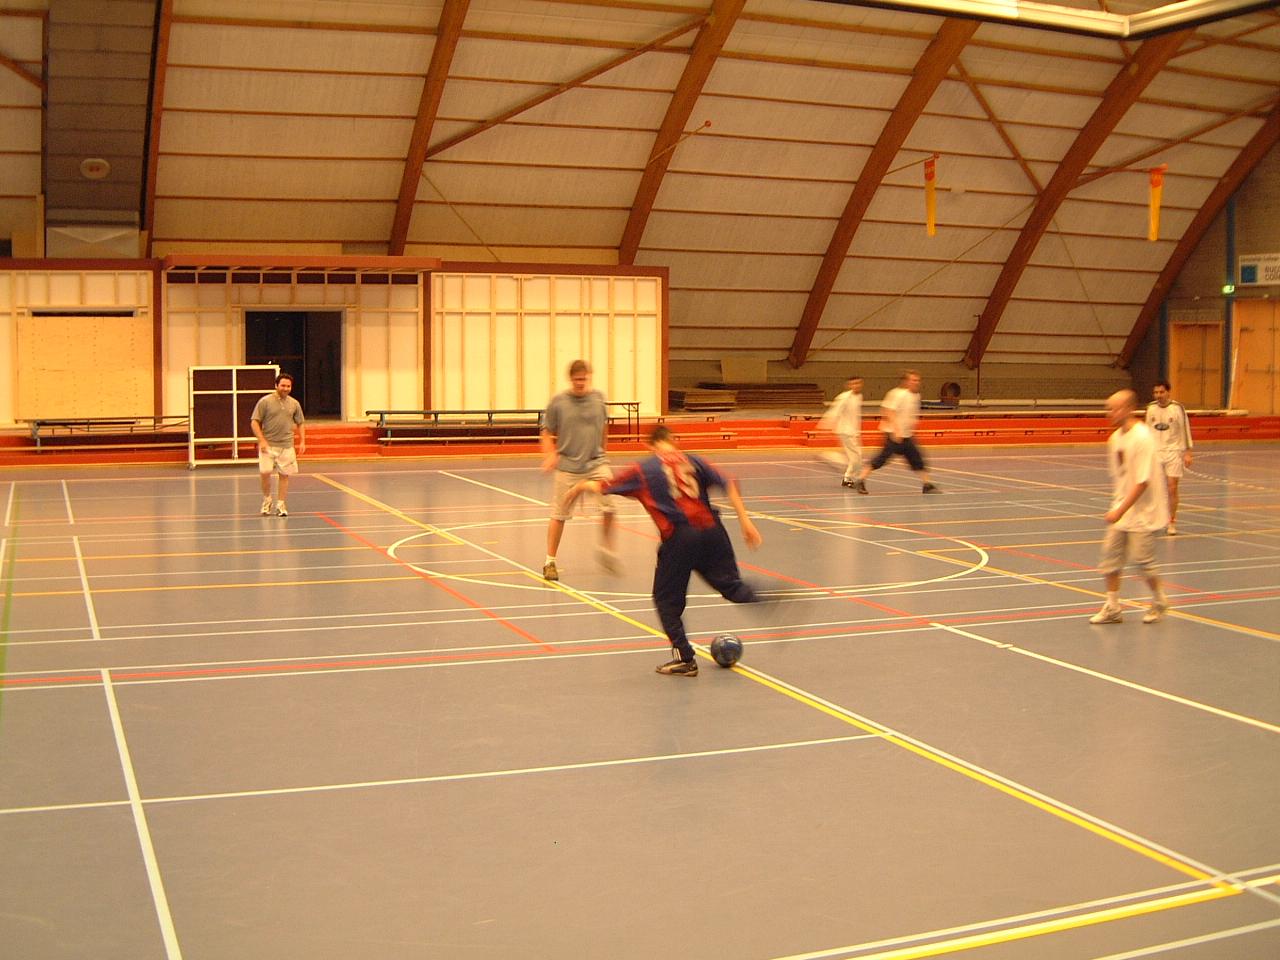 maartent nature characters humanoids soccer indoorsoccer games sport sports